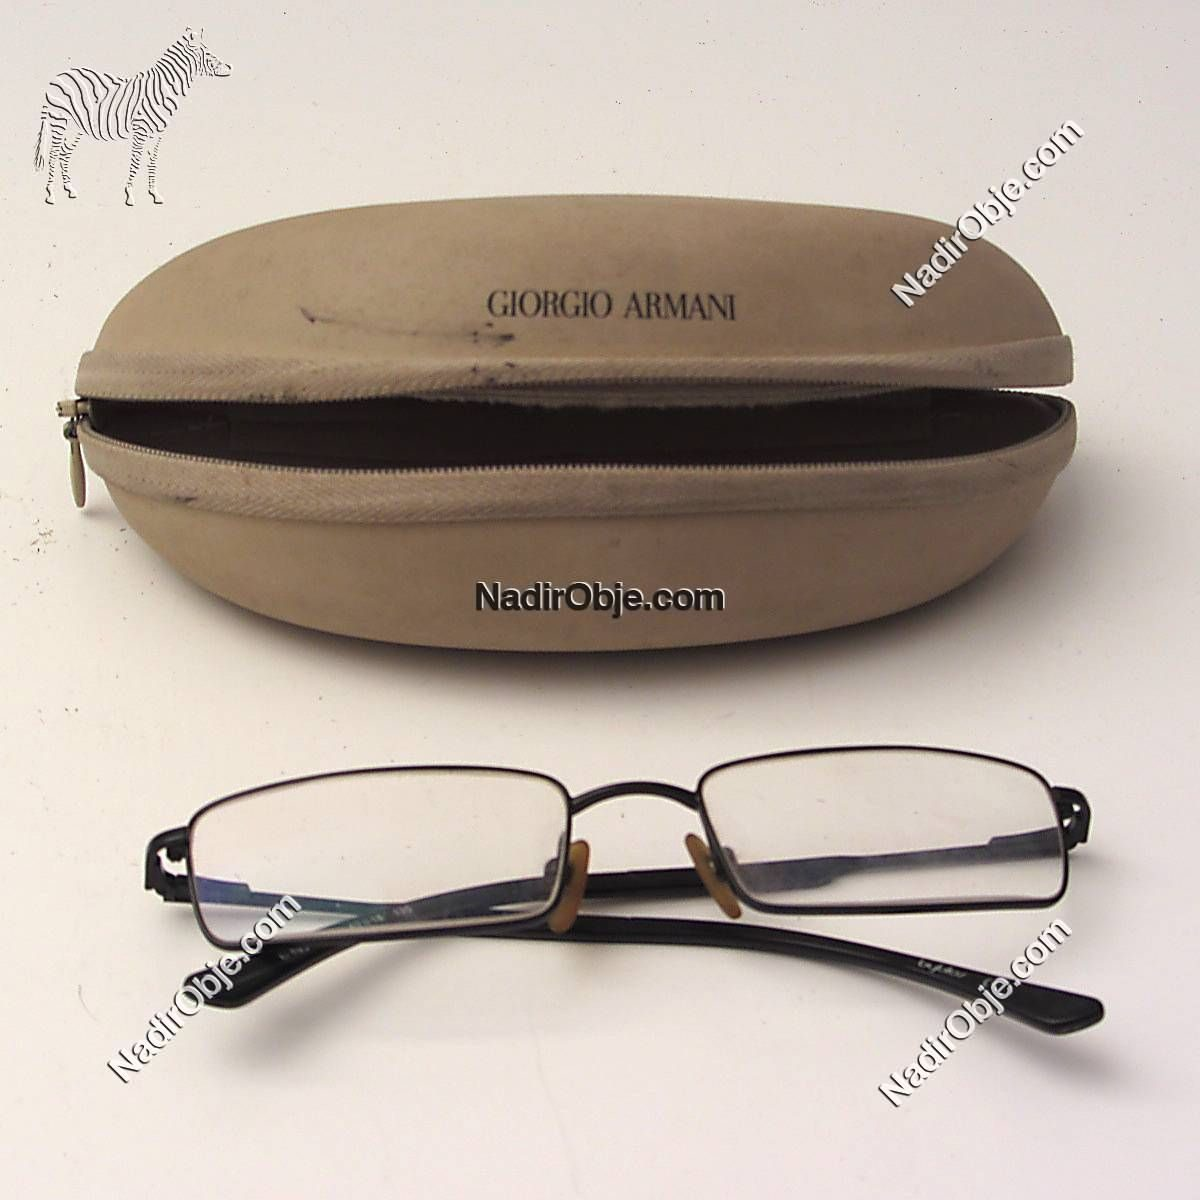 Giorgio Armani Gözlük Cam-Taş Objeler Giorgio Armani